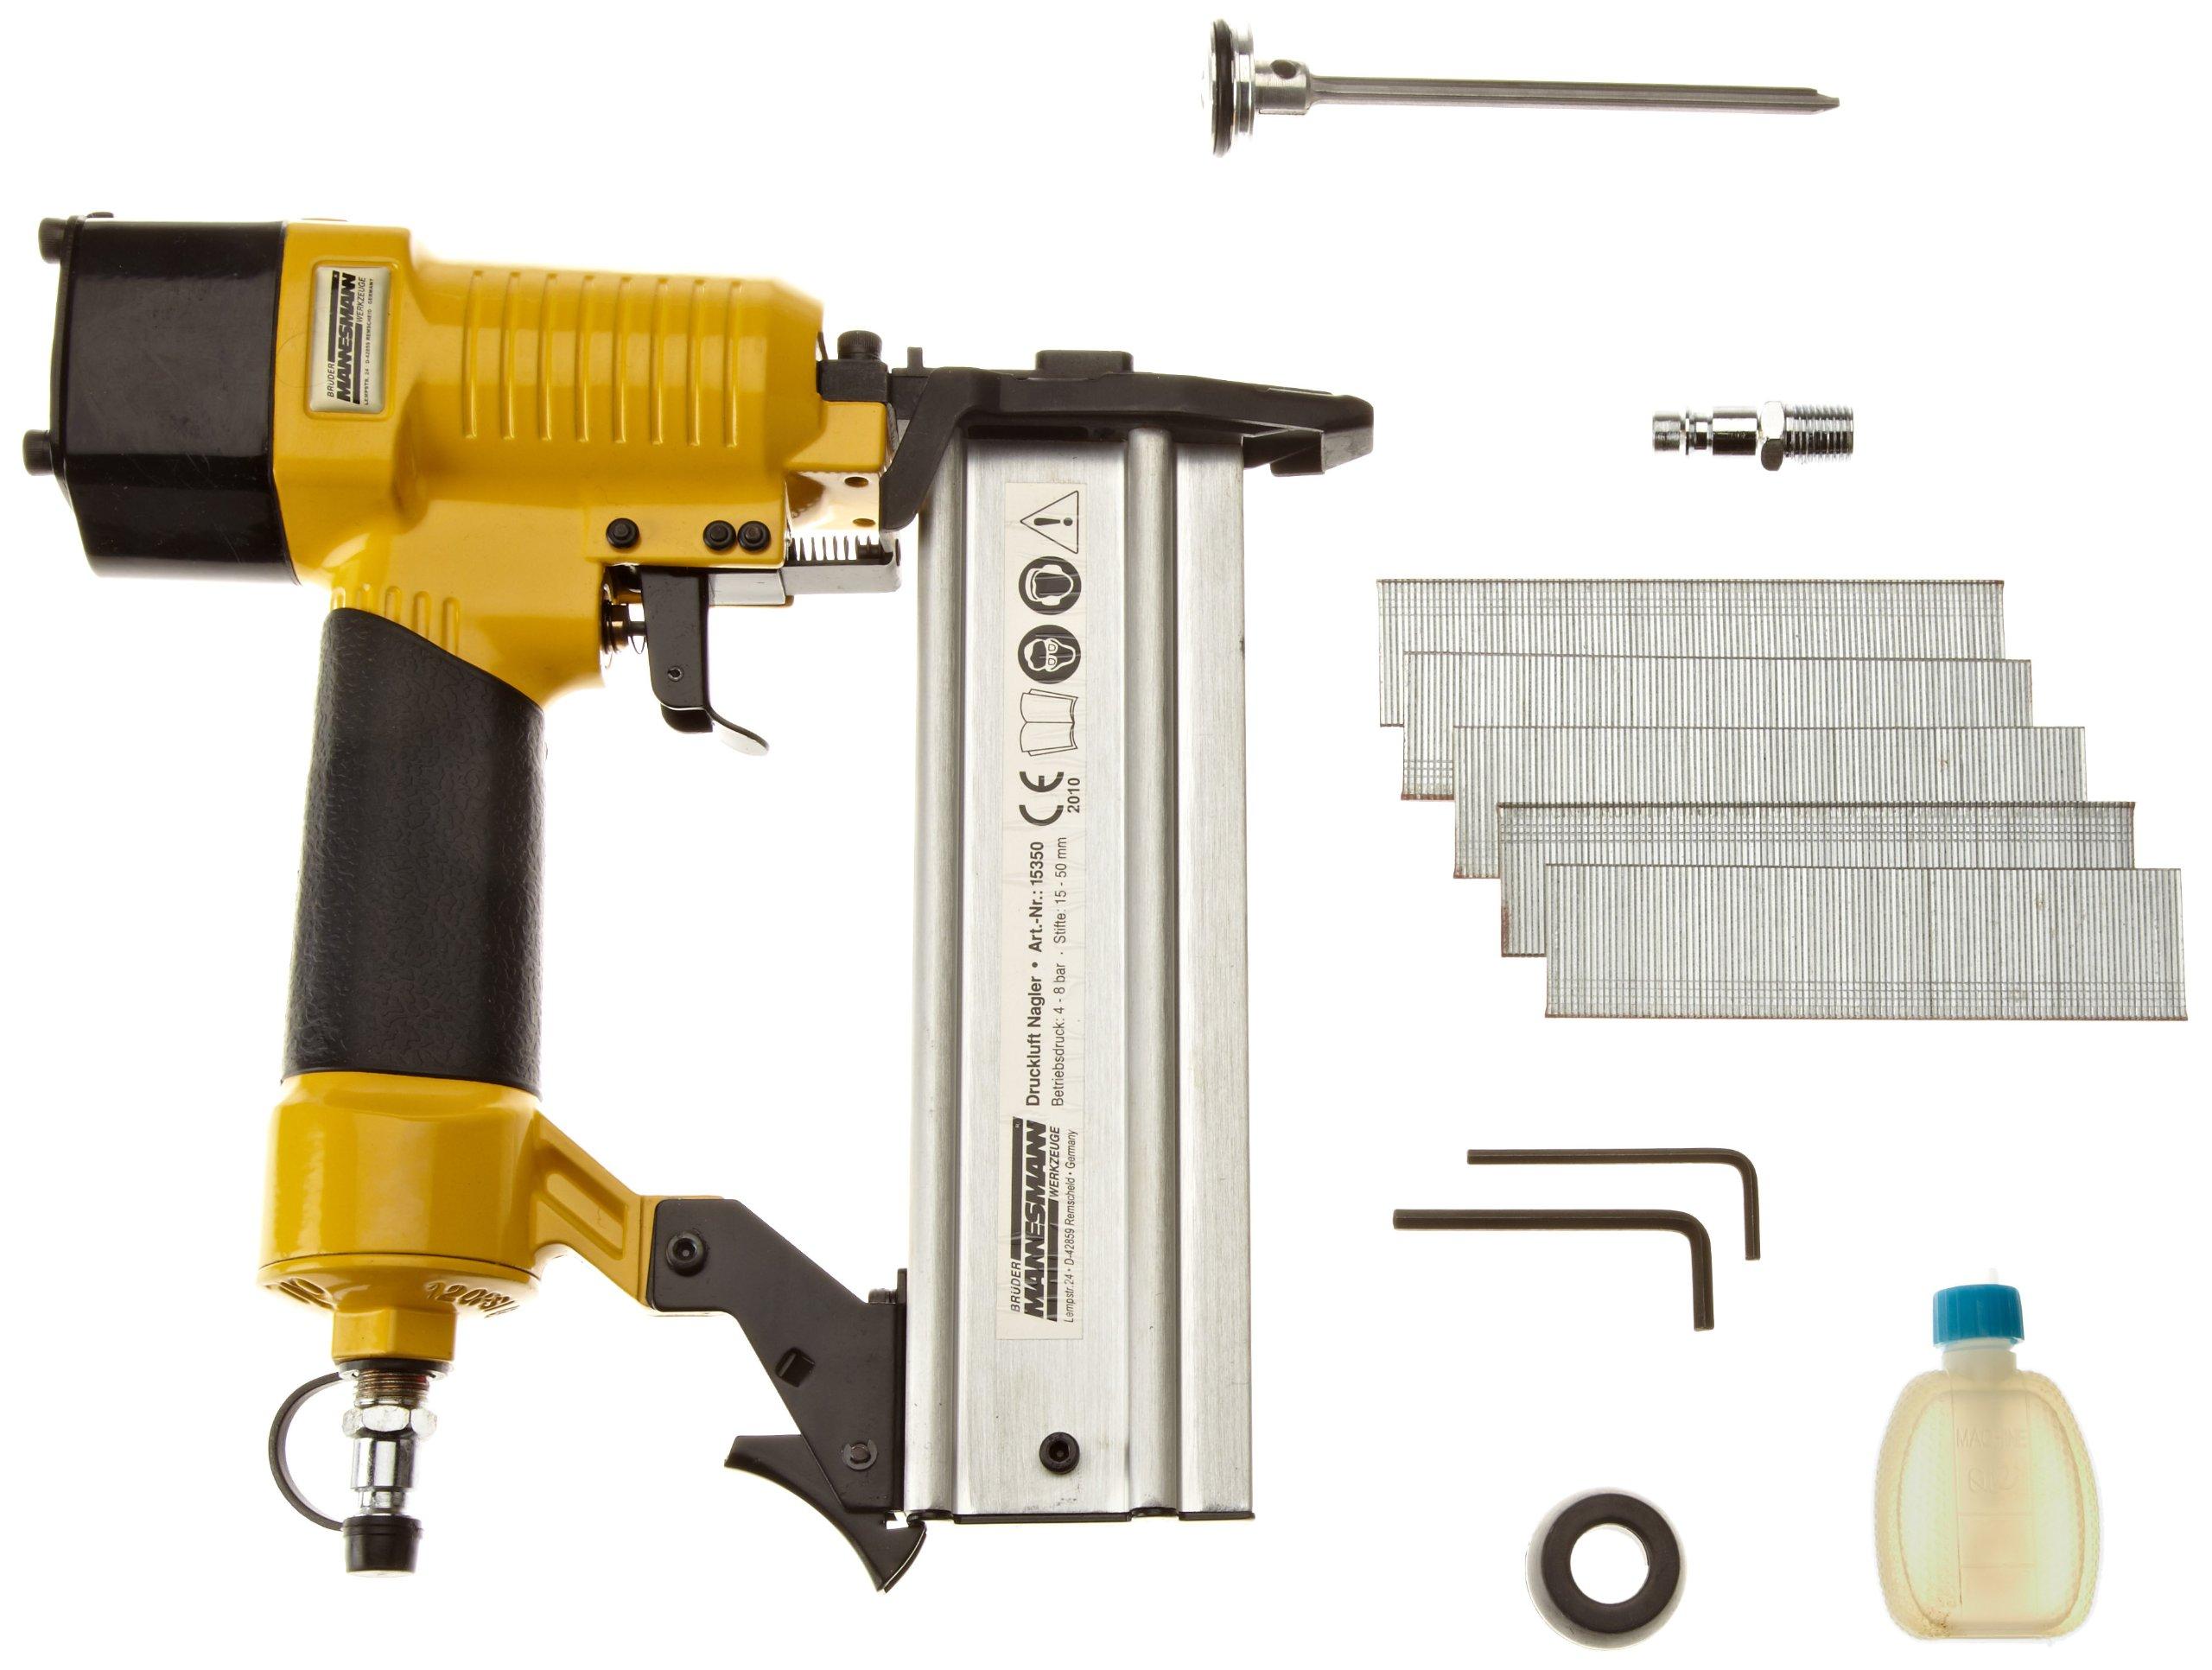 Brüder Mannesmann Werkzeuge M15350 - Clavadora para acabados [Importado de Alemania] product image